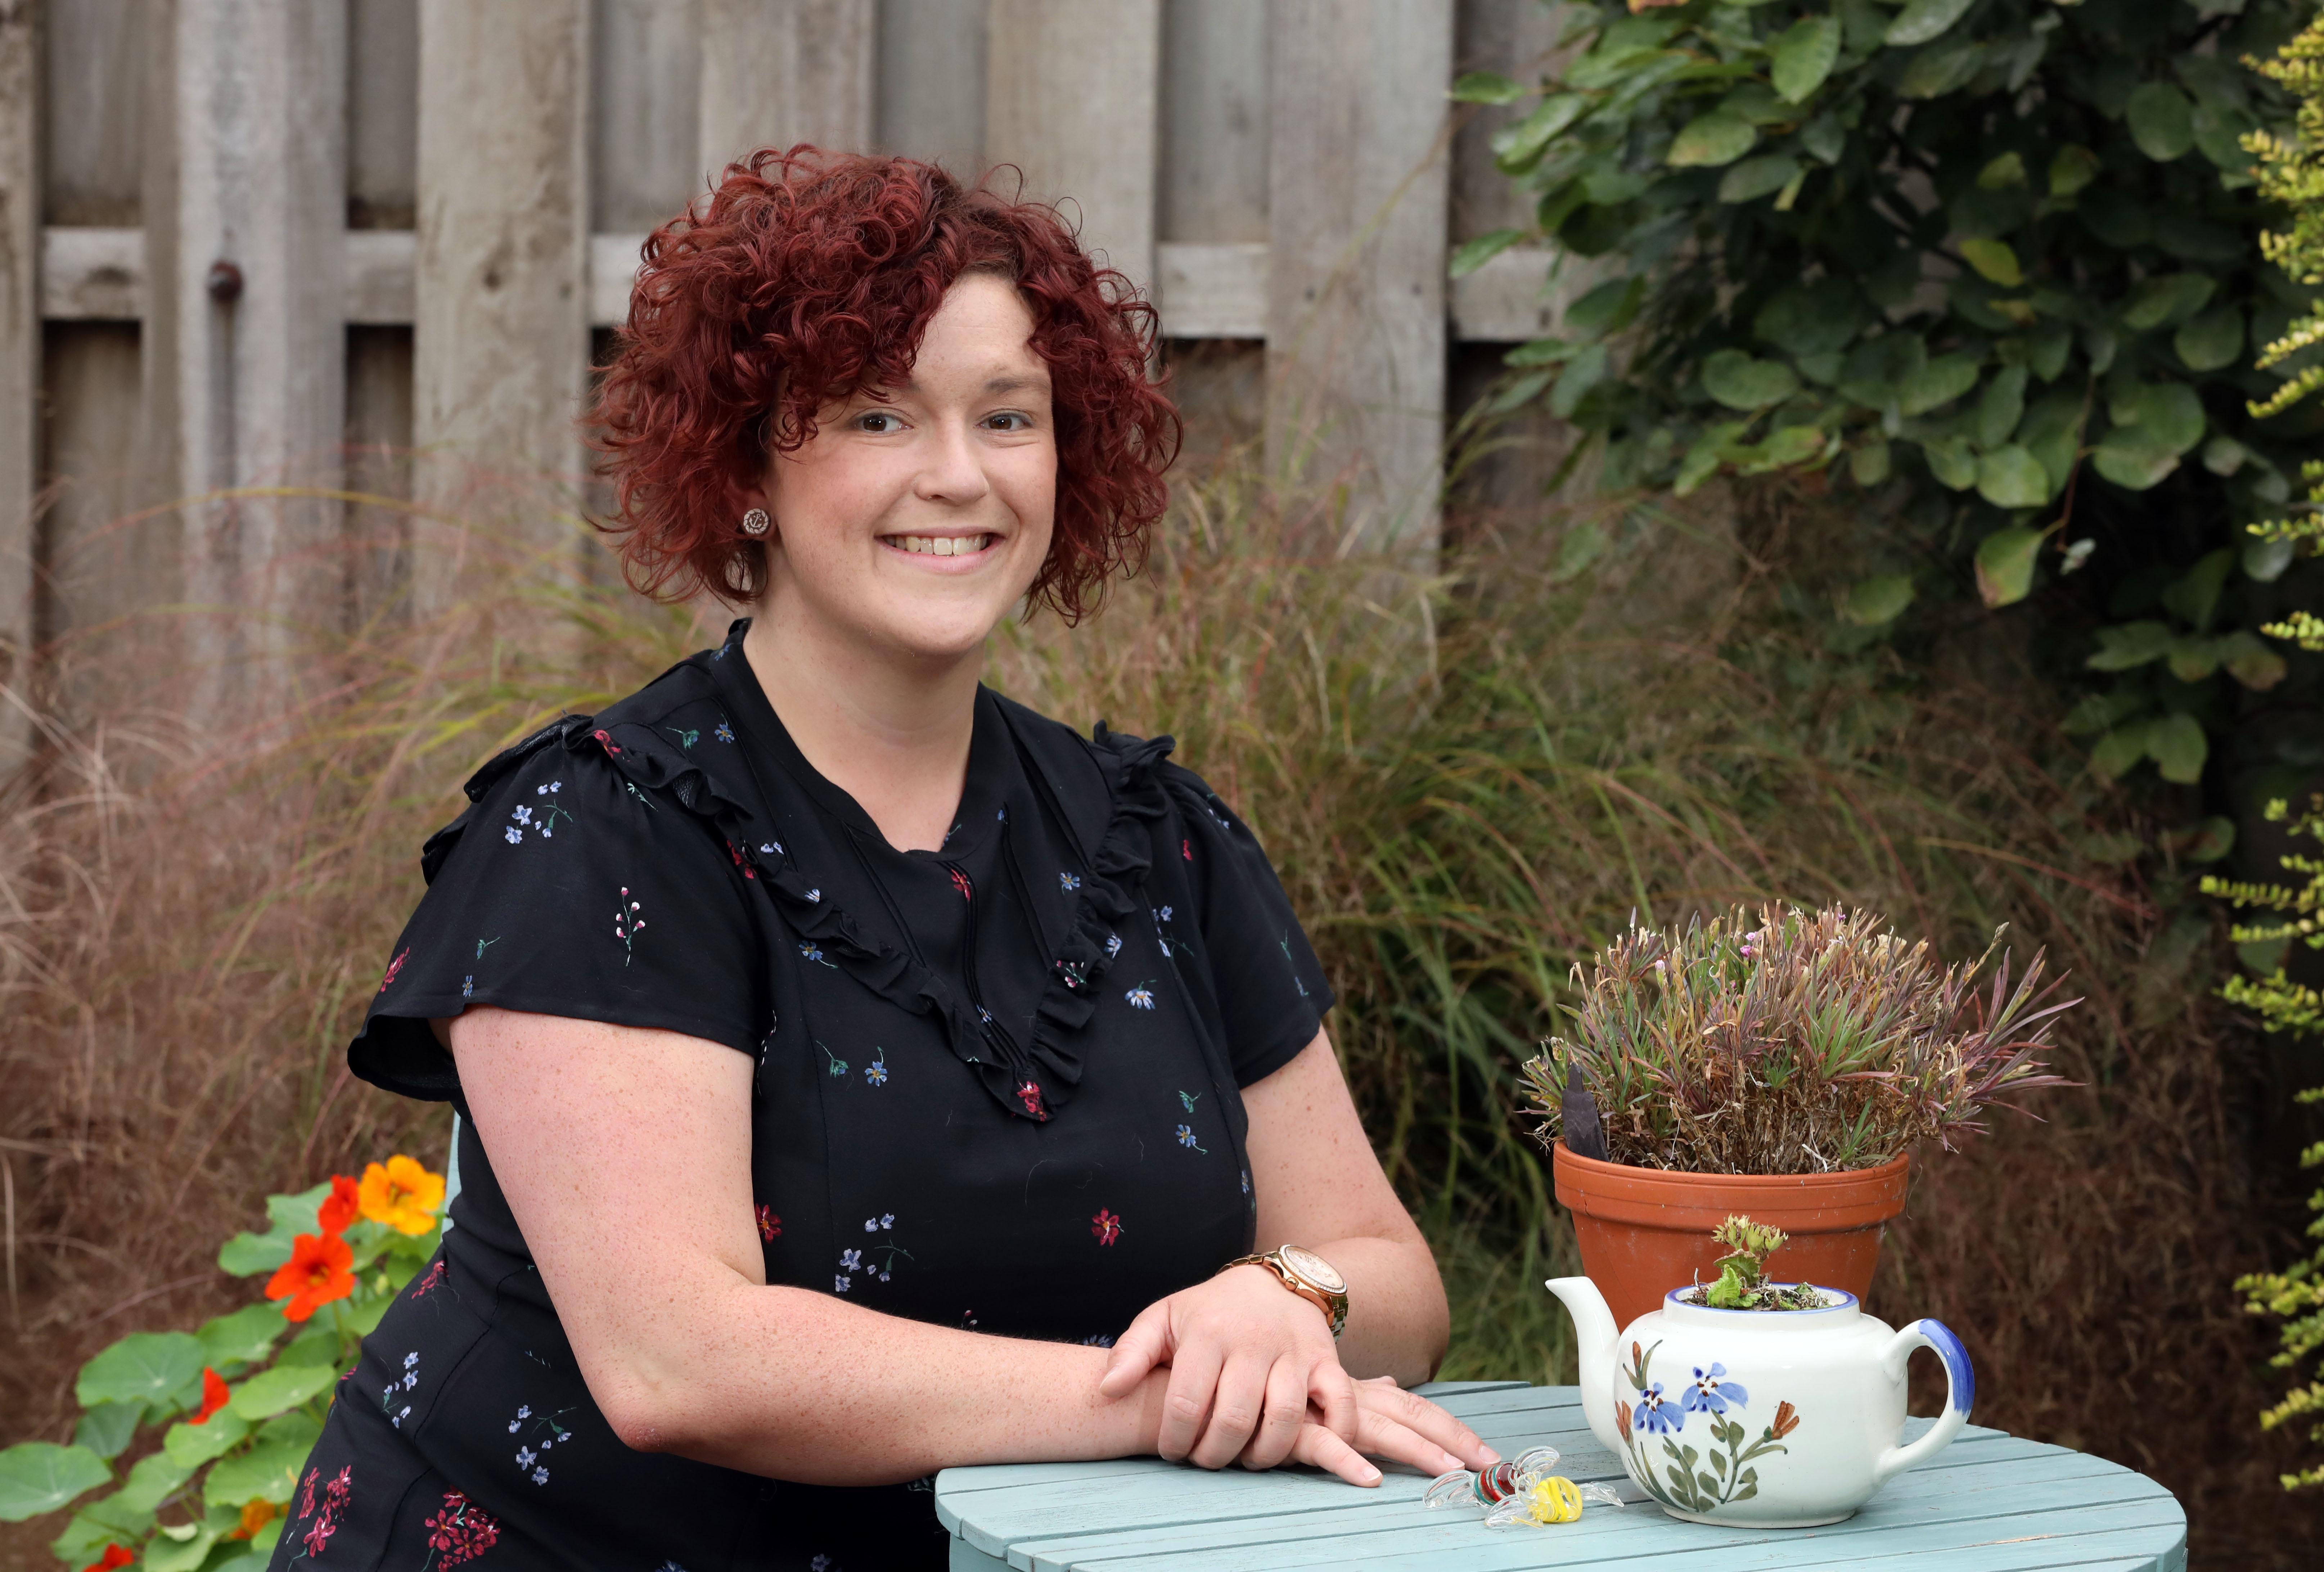 Bekki Miller is a member of our Diabetes Research Steering Group